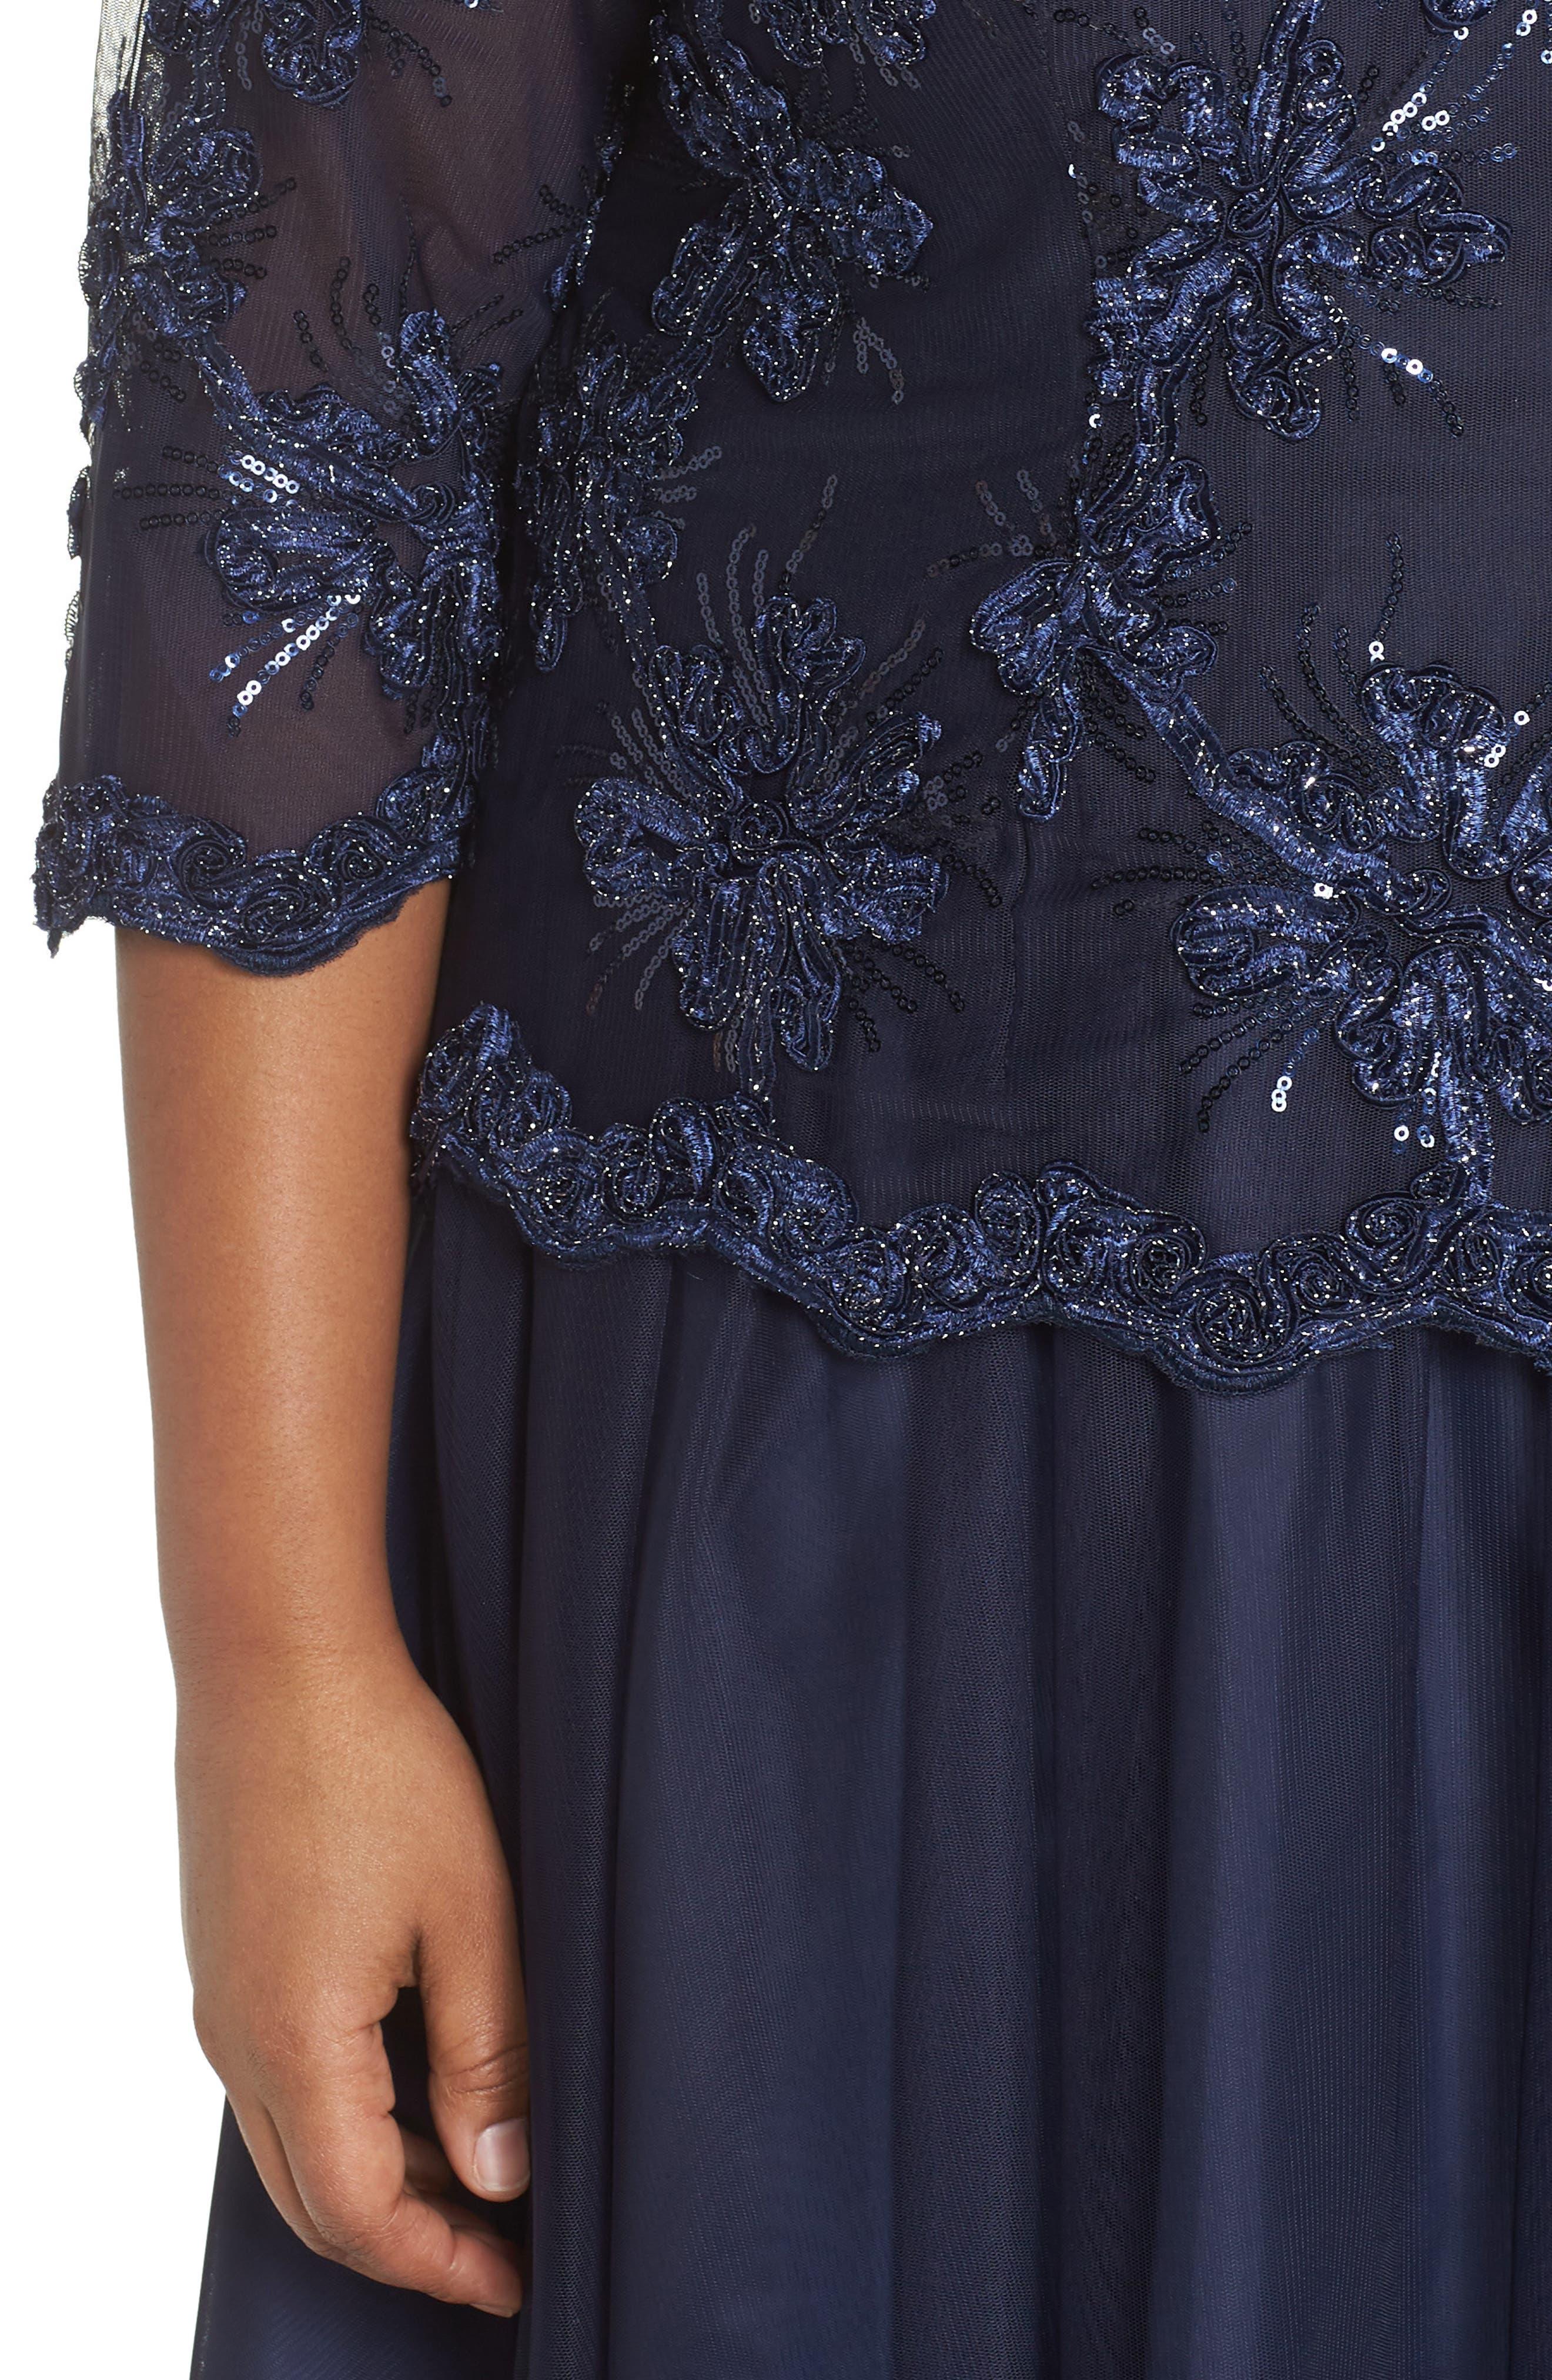 Embellished Bodice Tea Length Mesh Dress,                             Alternate thumbnail 4, color,                             410